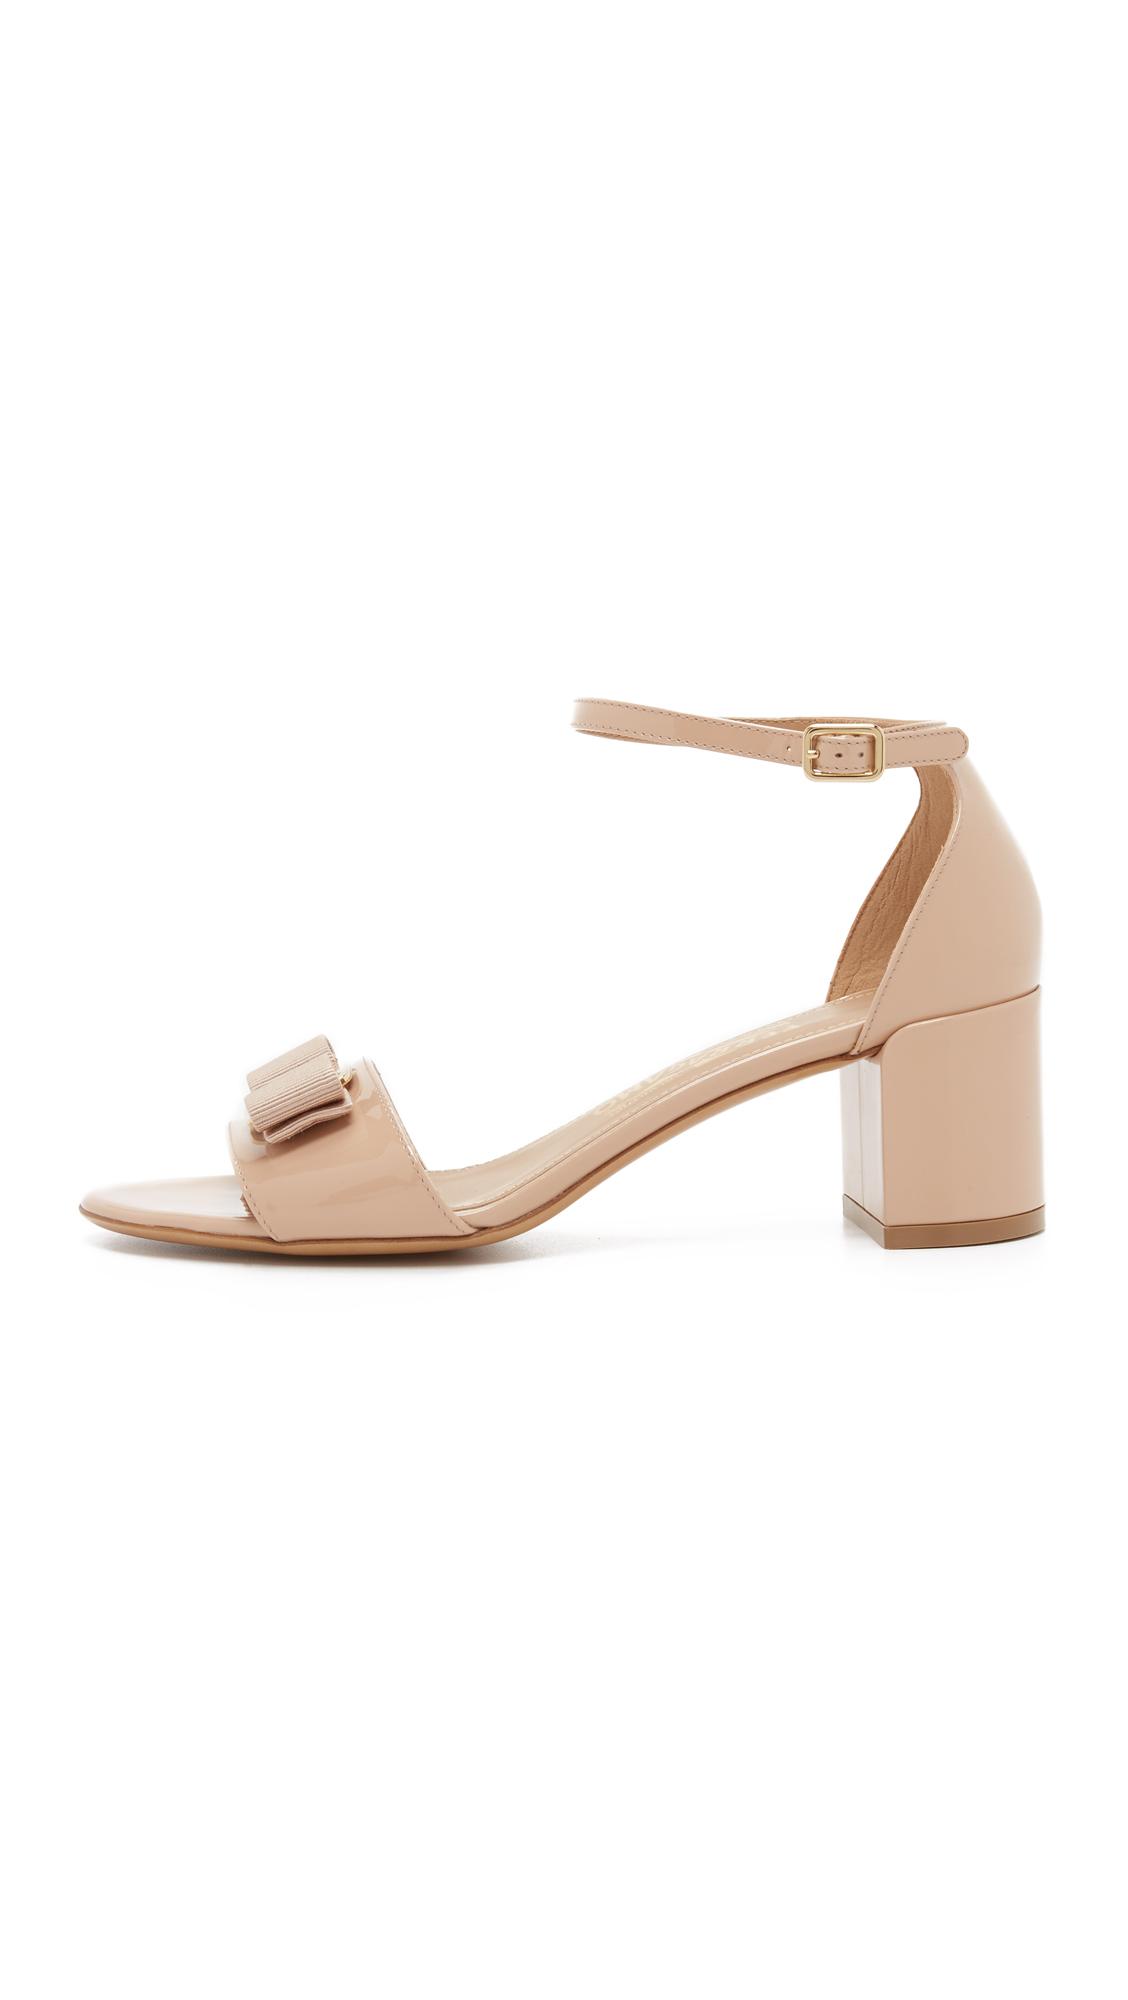 b669ce98eb33 Salvatore Ferragamo Gavina City Sandals